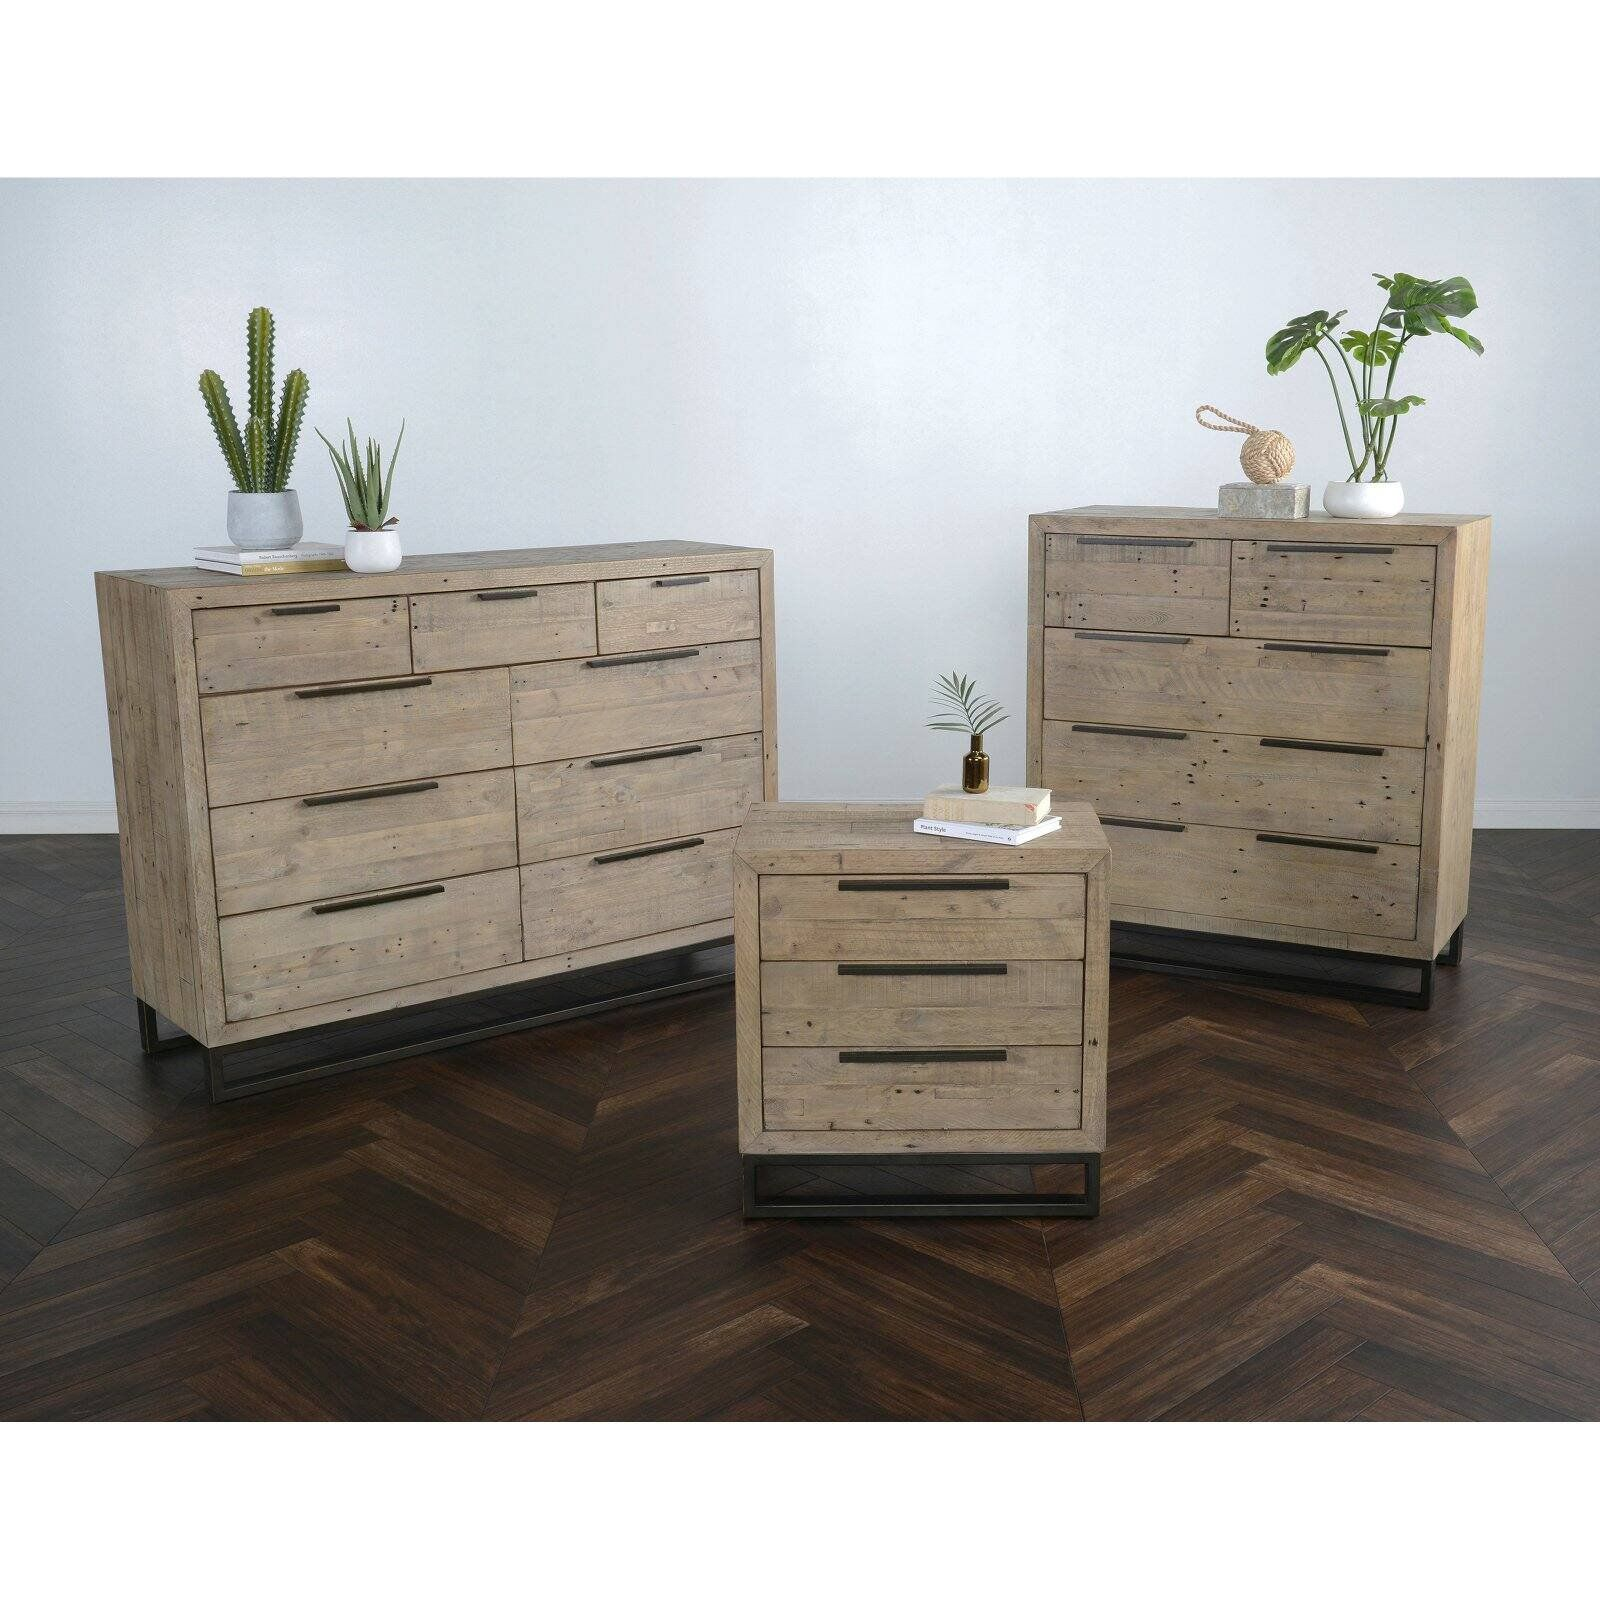 Kosas Home Norton 5 Drawer Bedroom Chest Walmart Com In 2021 Kosas Home Furniture Double Dresser [ 1600 x 1600 Pixel ]